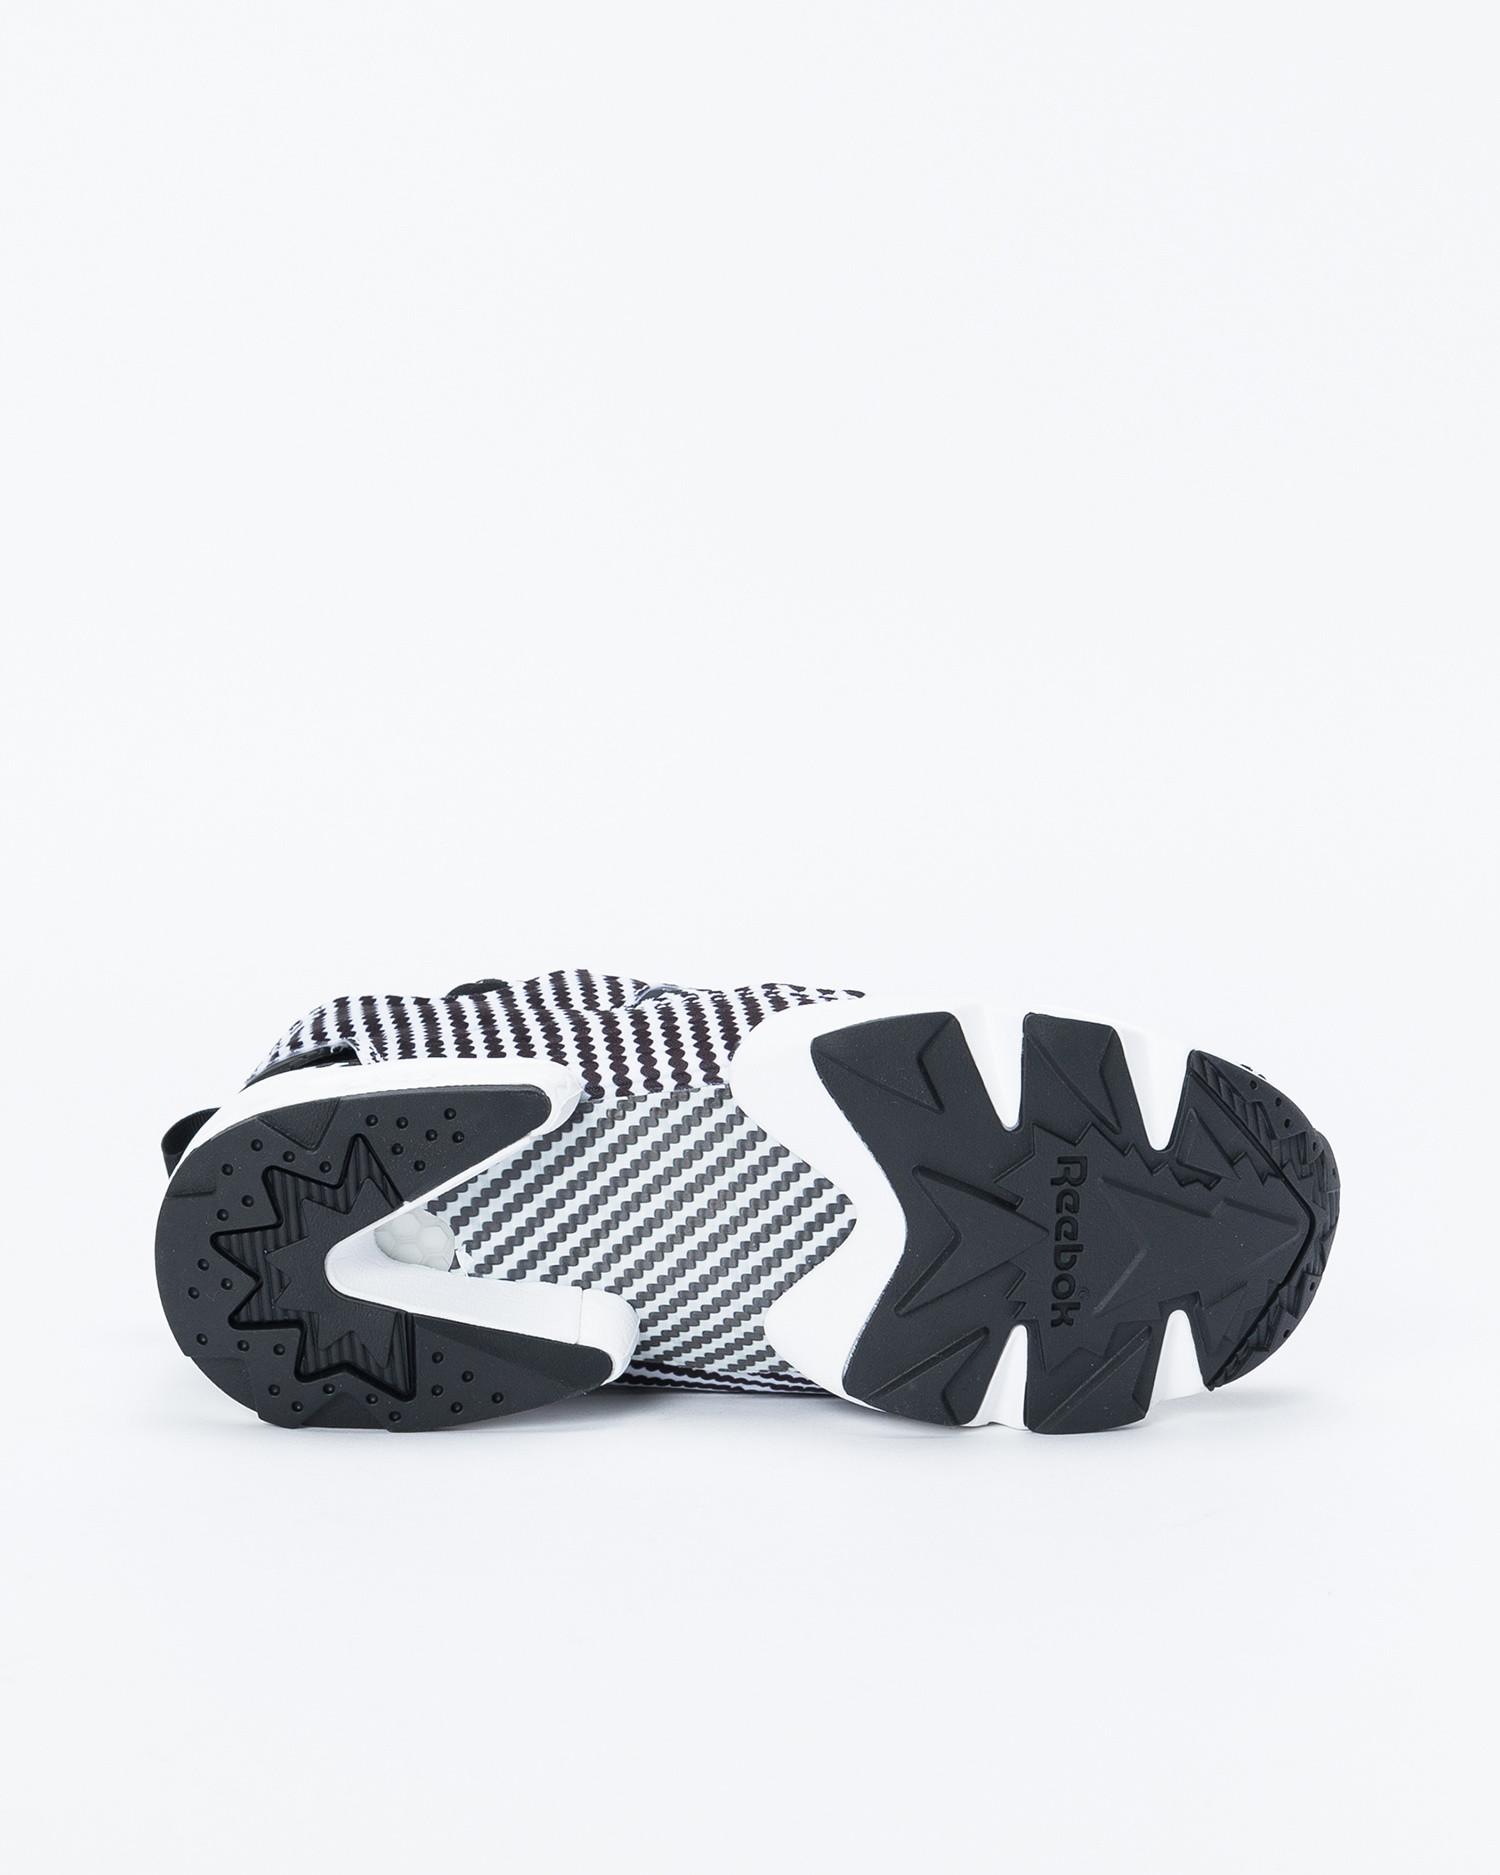 Reebok Instapump Fury OG Carbon Fiber Black/White